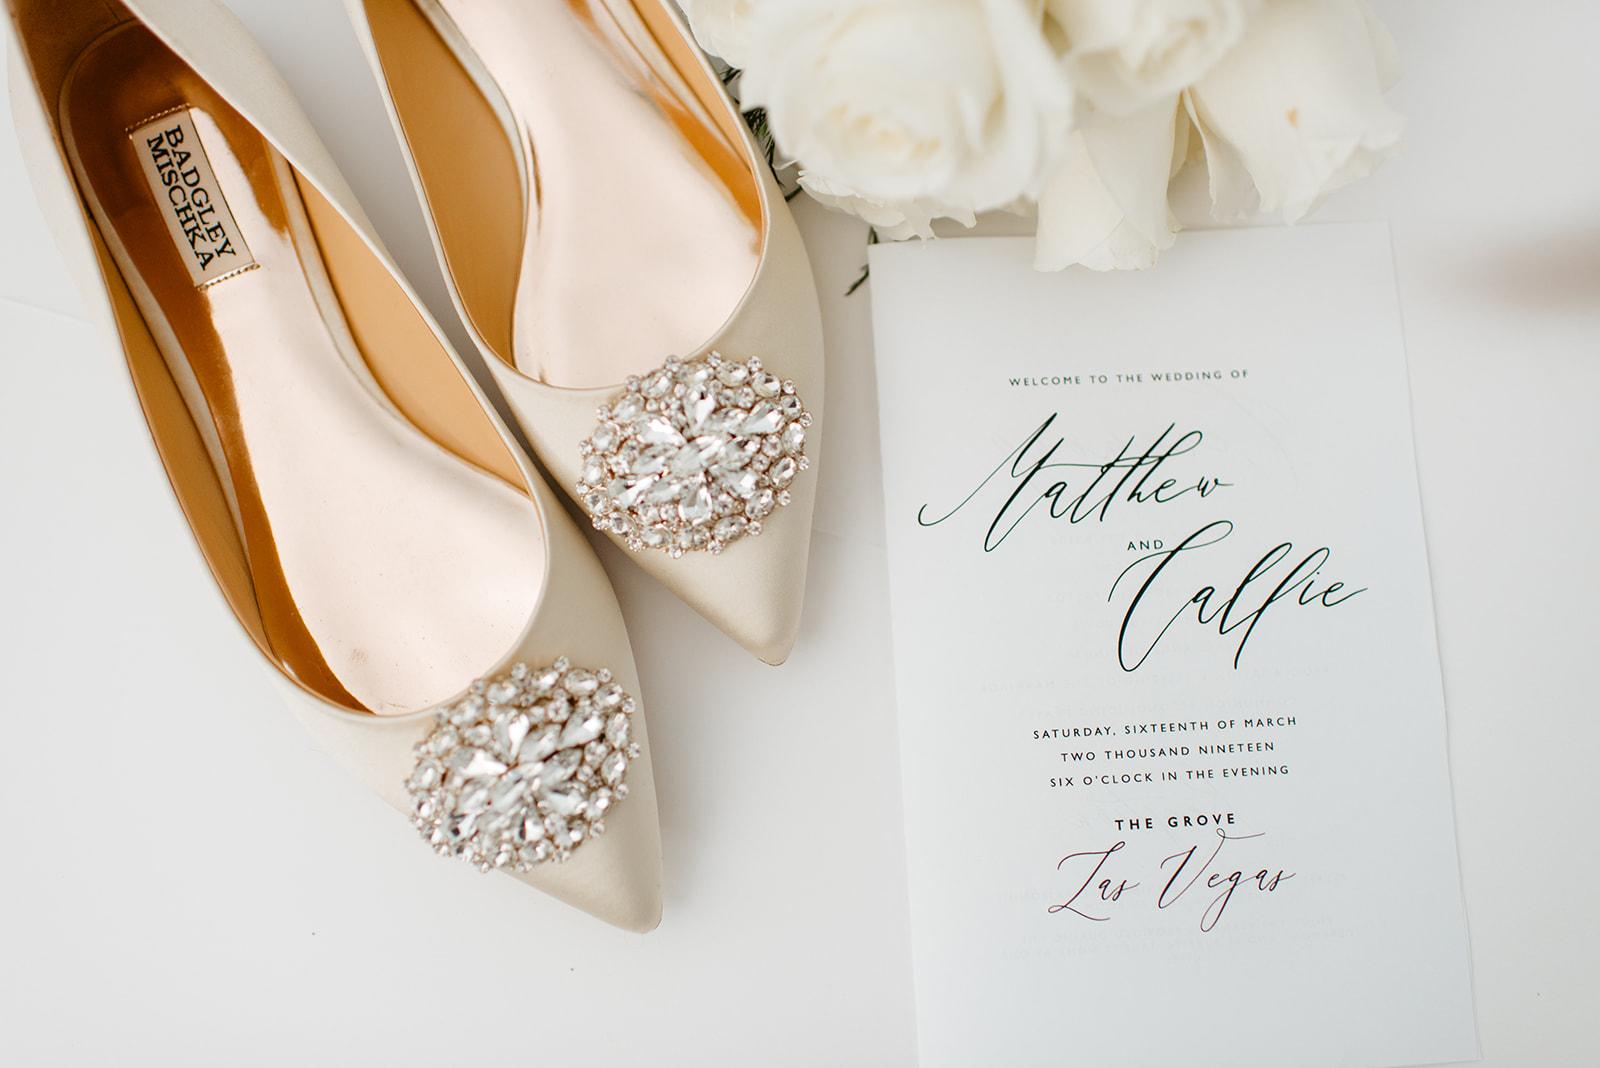 Kinzer Wedding - The Grove, Las Vegas #BrideShoes